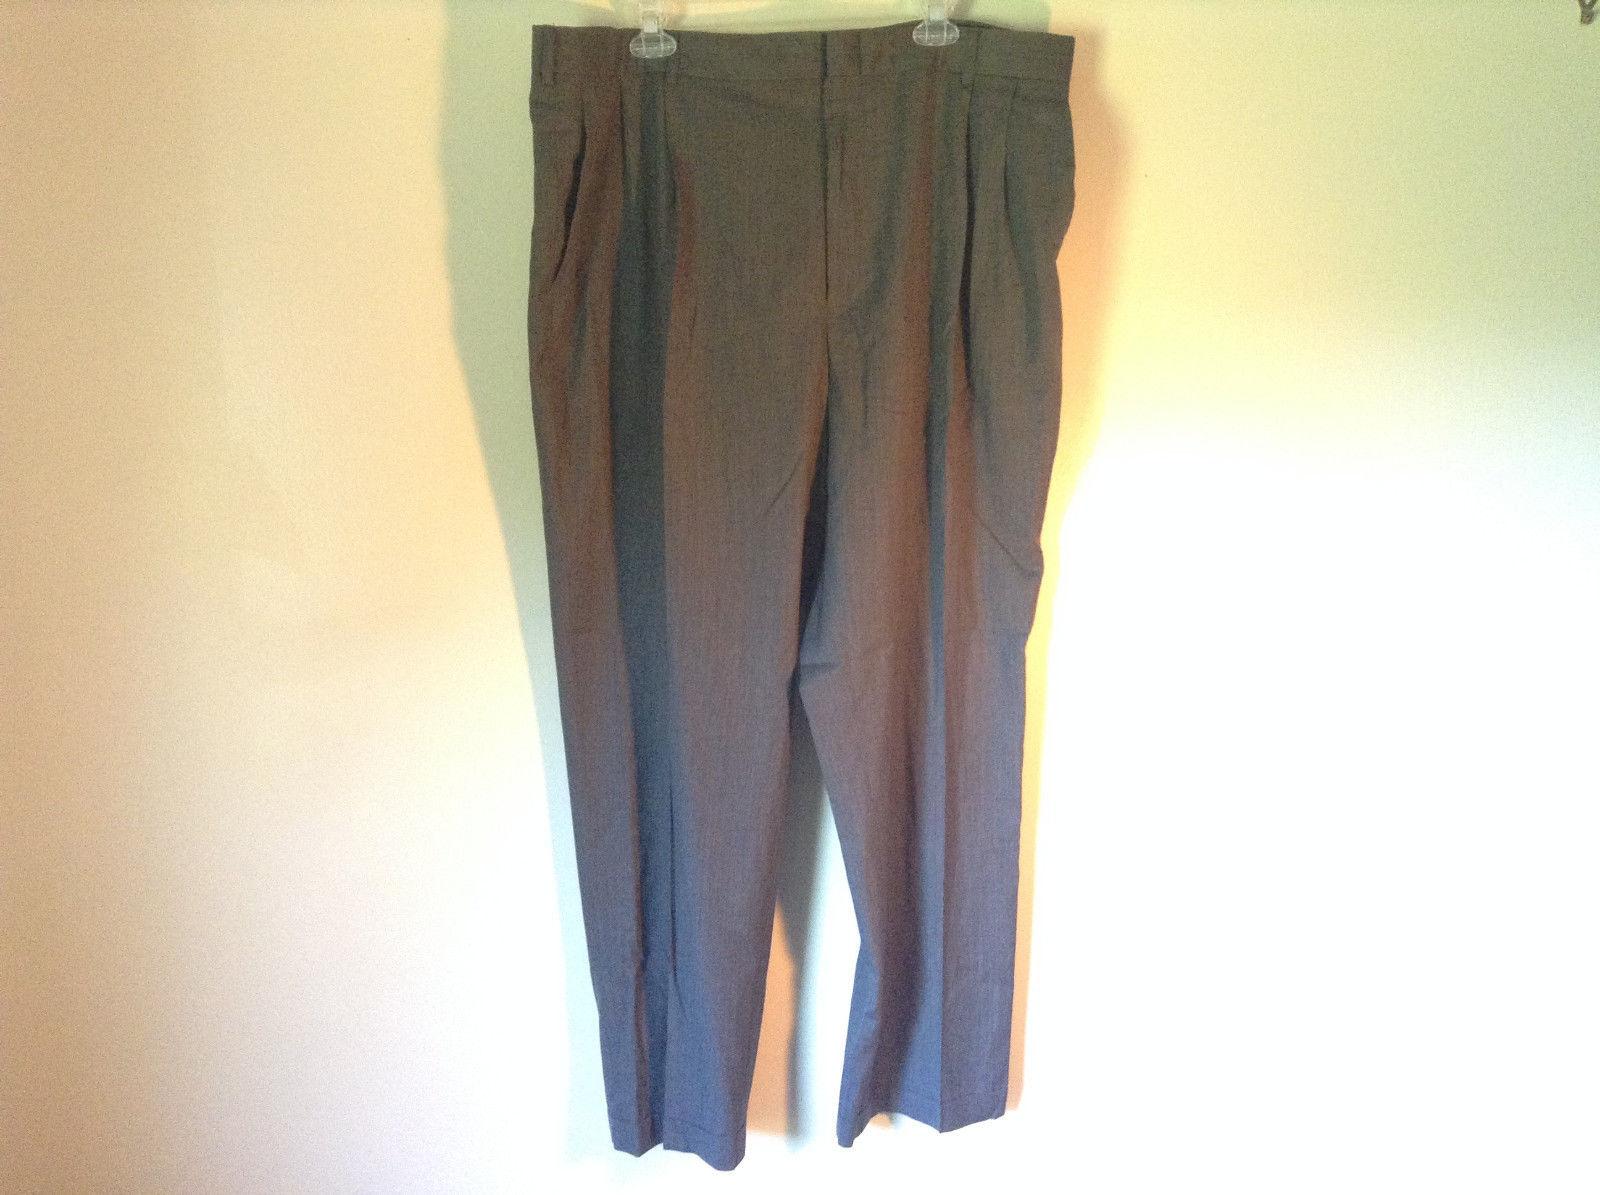 Dark Gray Pleated Dress Pants Jos A Bank Size 42W by 30L Front Backk Pockets